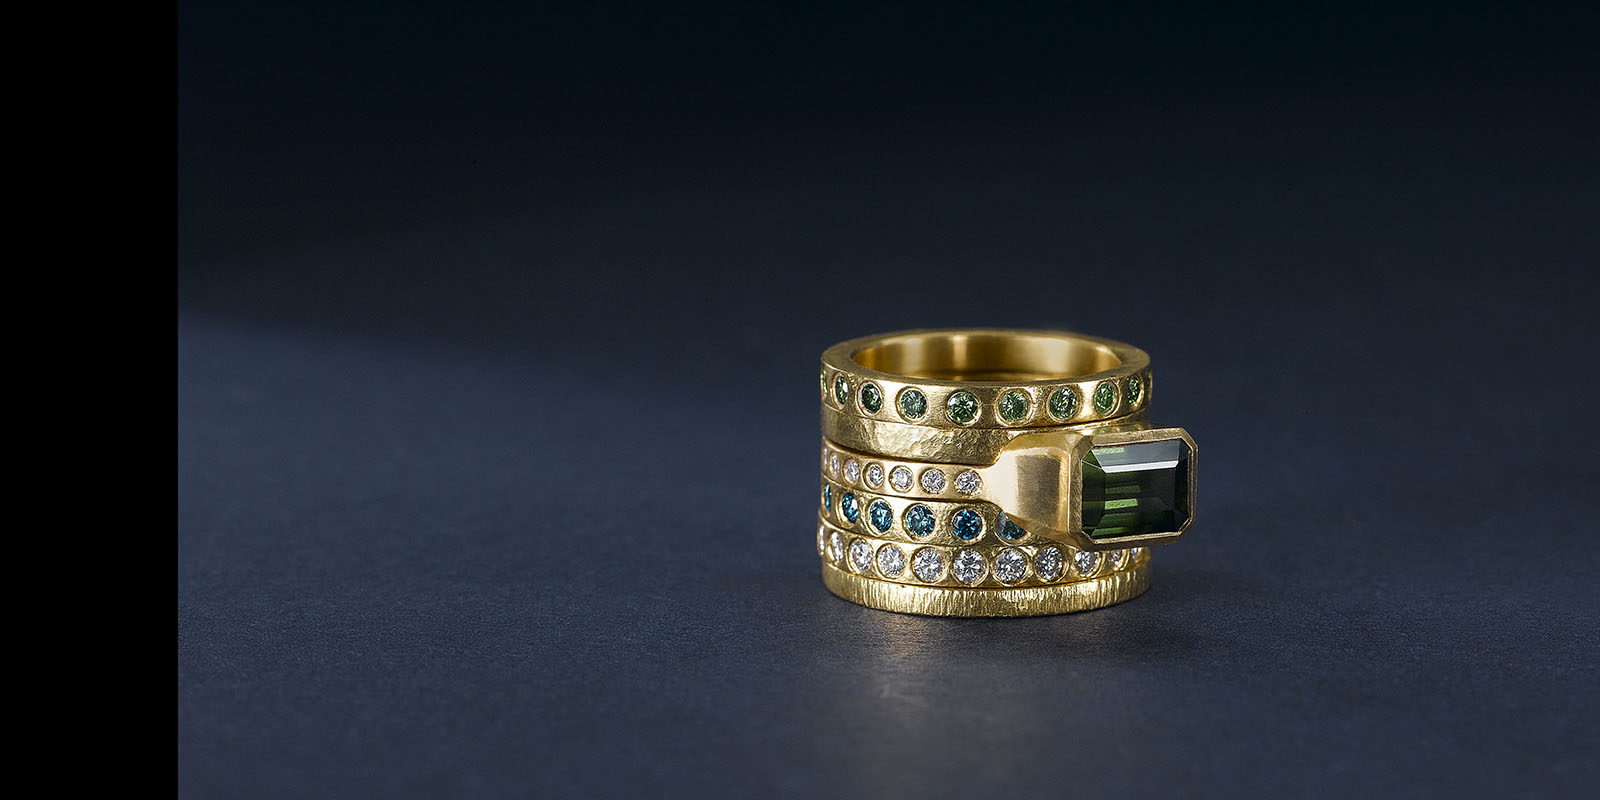 Stacking bands. 22 karat gold, color diamonds. Tourmaline solitaire.